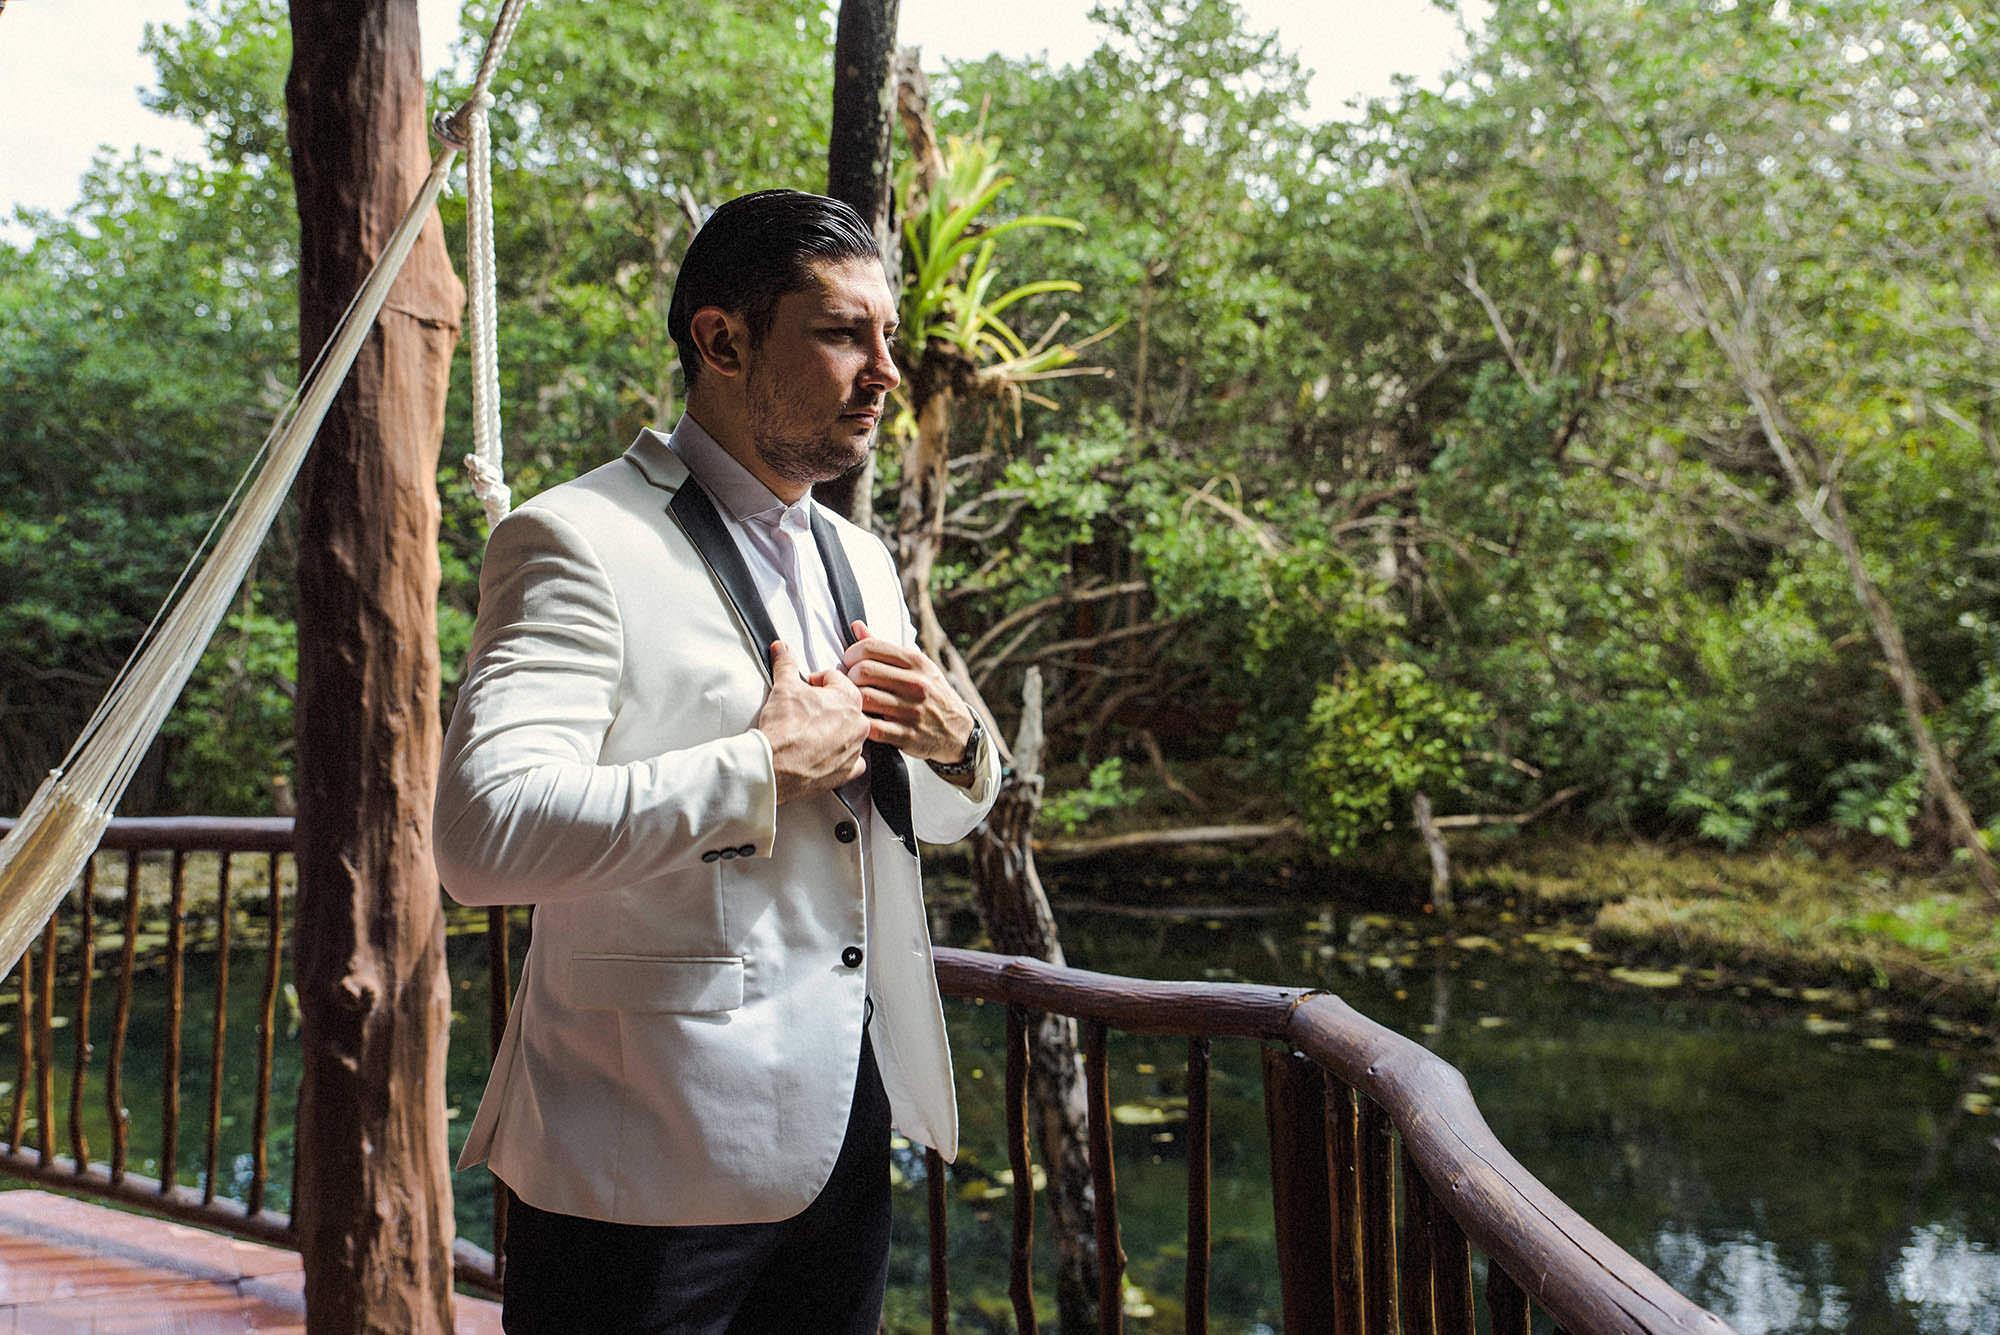 Wedding playa del carmen planner destination mexico magali espinosa10-WEB.jpg